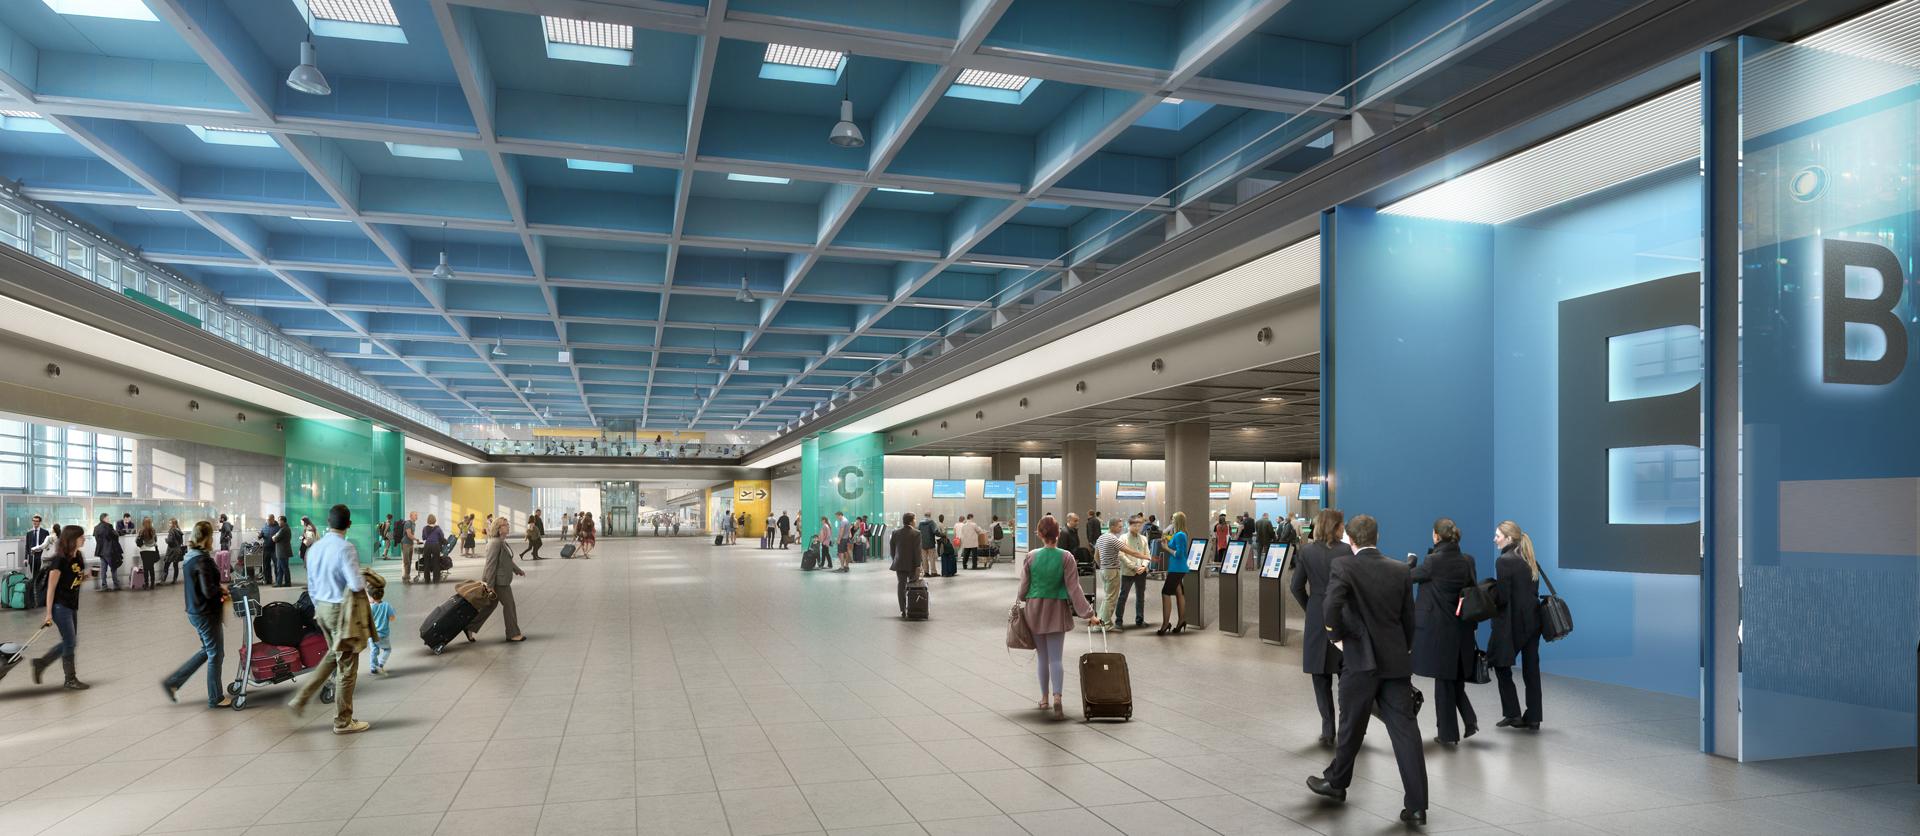 MAP-Aeroport Marseille Provence-VUE POUILLON_full